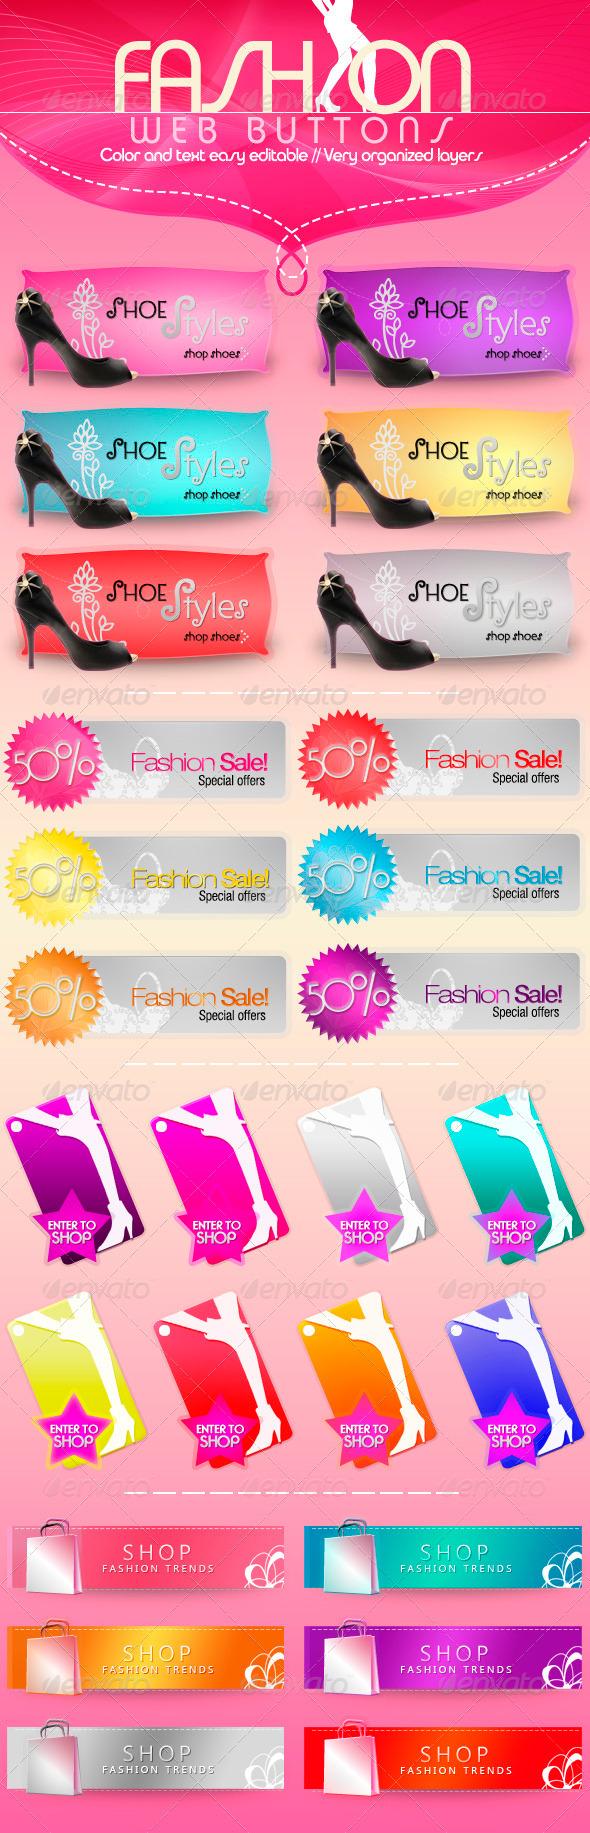 GraphicRiver Fashion Web Buttons 302683